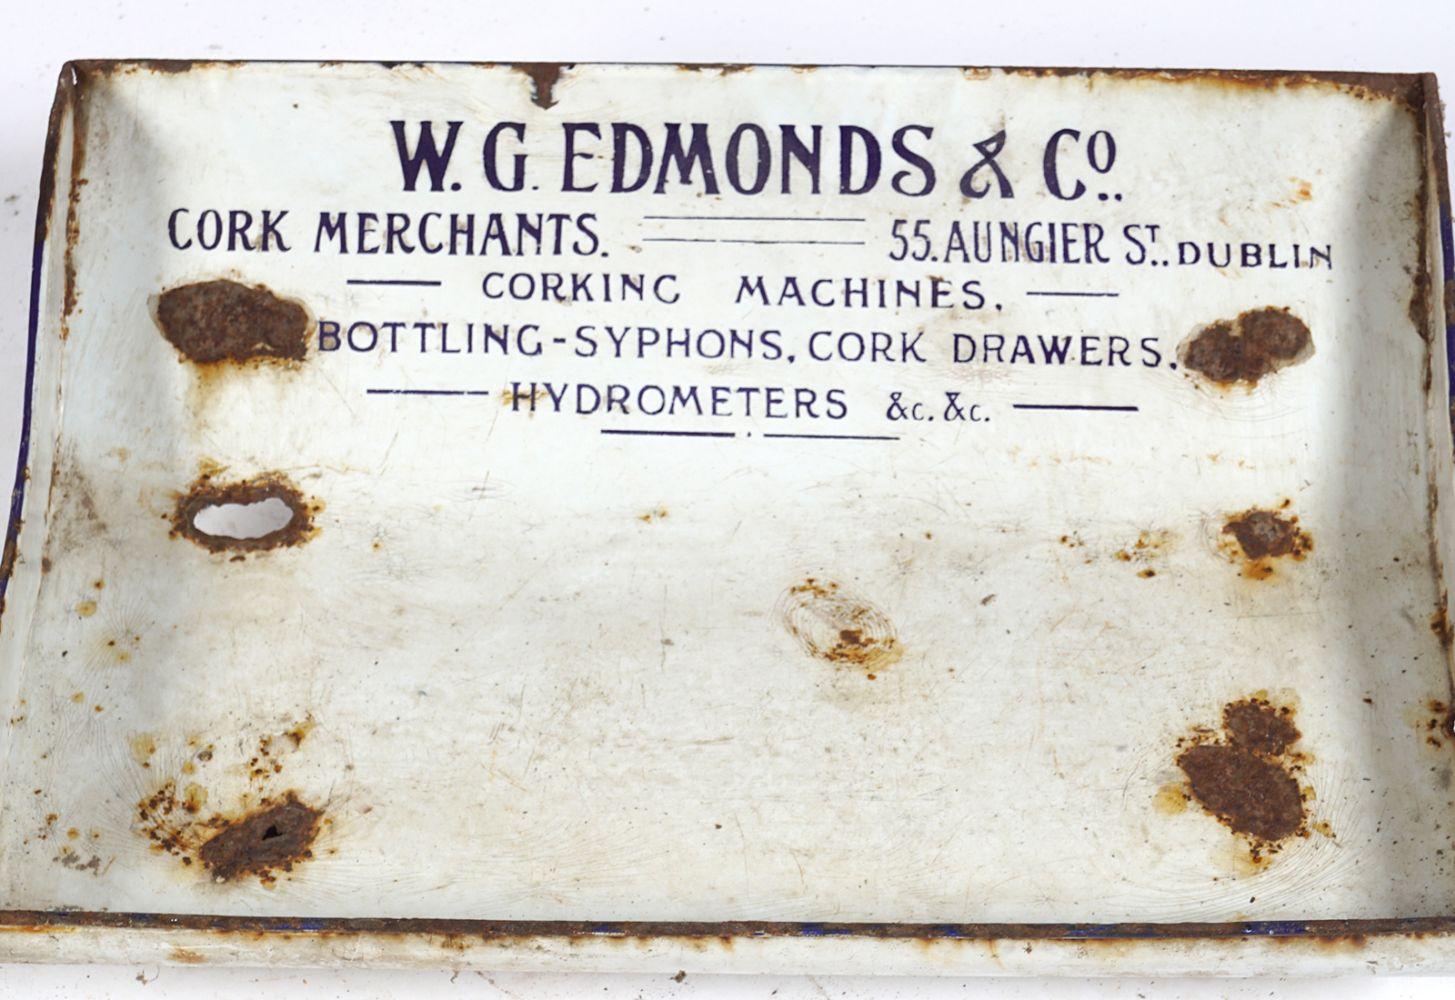 W. G. EDMONDS & CO. DESK SIGN - Image 2 of 4